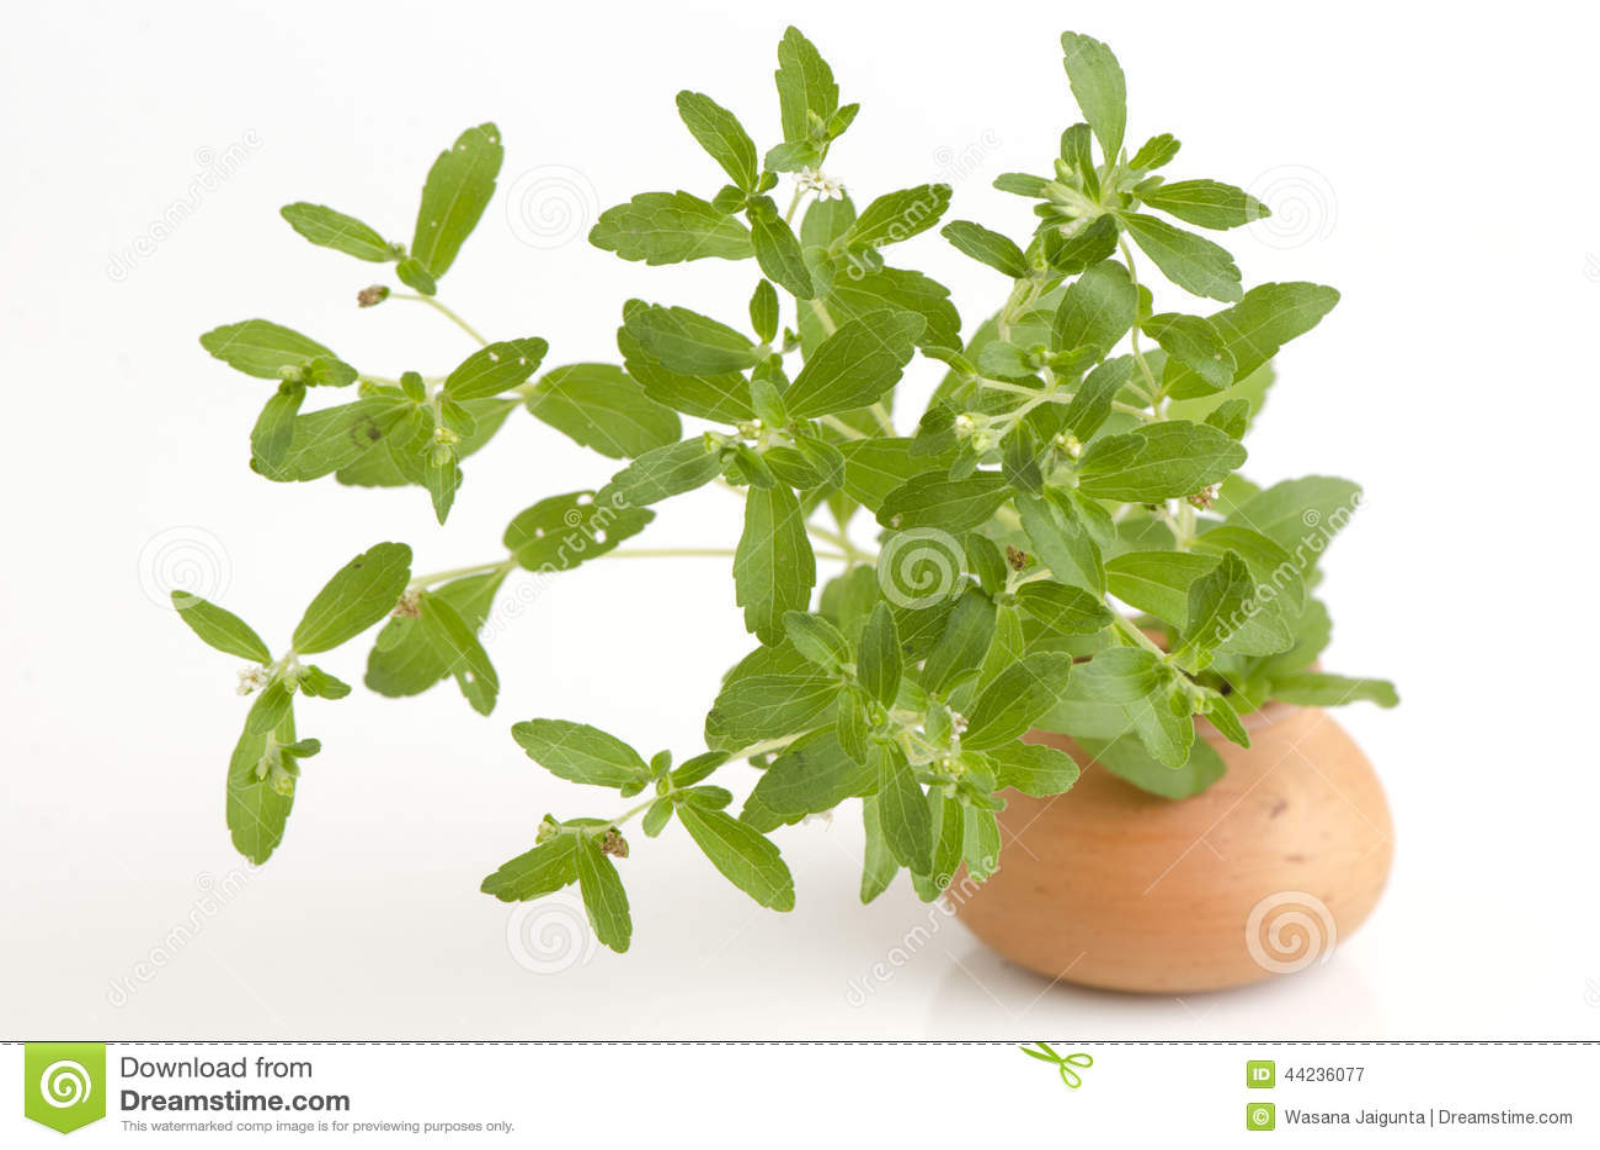 stevia rebaudiana bertoni trees stock photo image 44236077. Black Bedroom Furniture Sets. Home Design Ideas